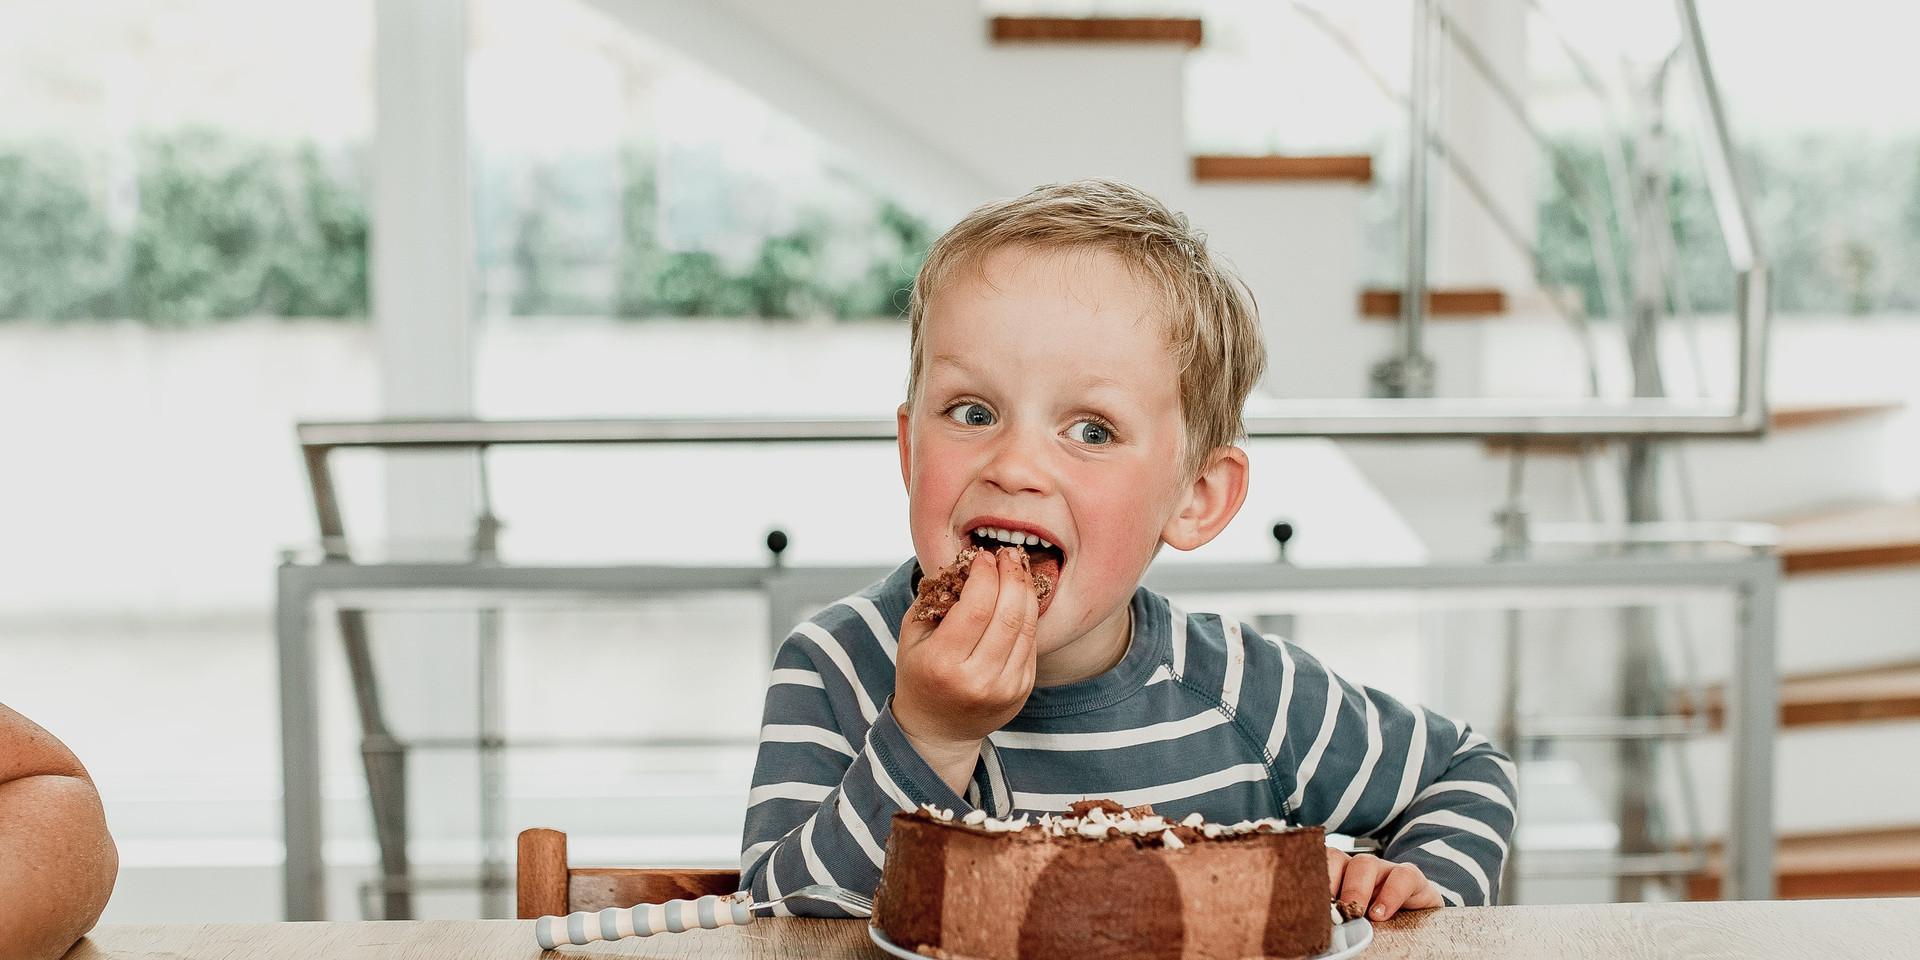 Cake-Smash, Kindershooting, lustiges Shooting, Junge, Coburg